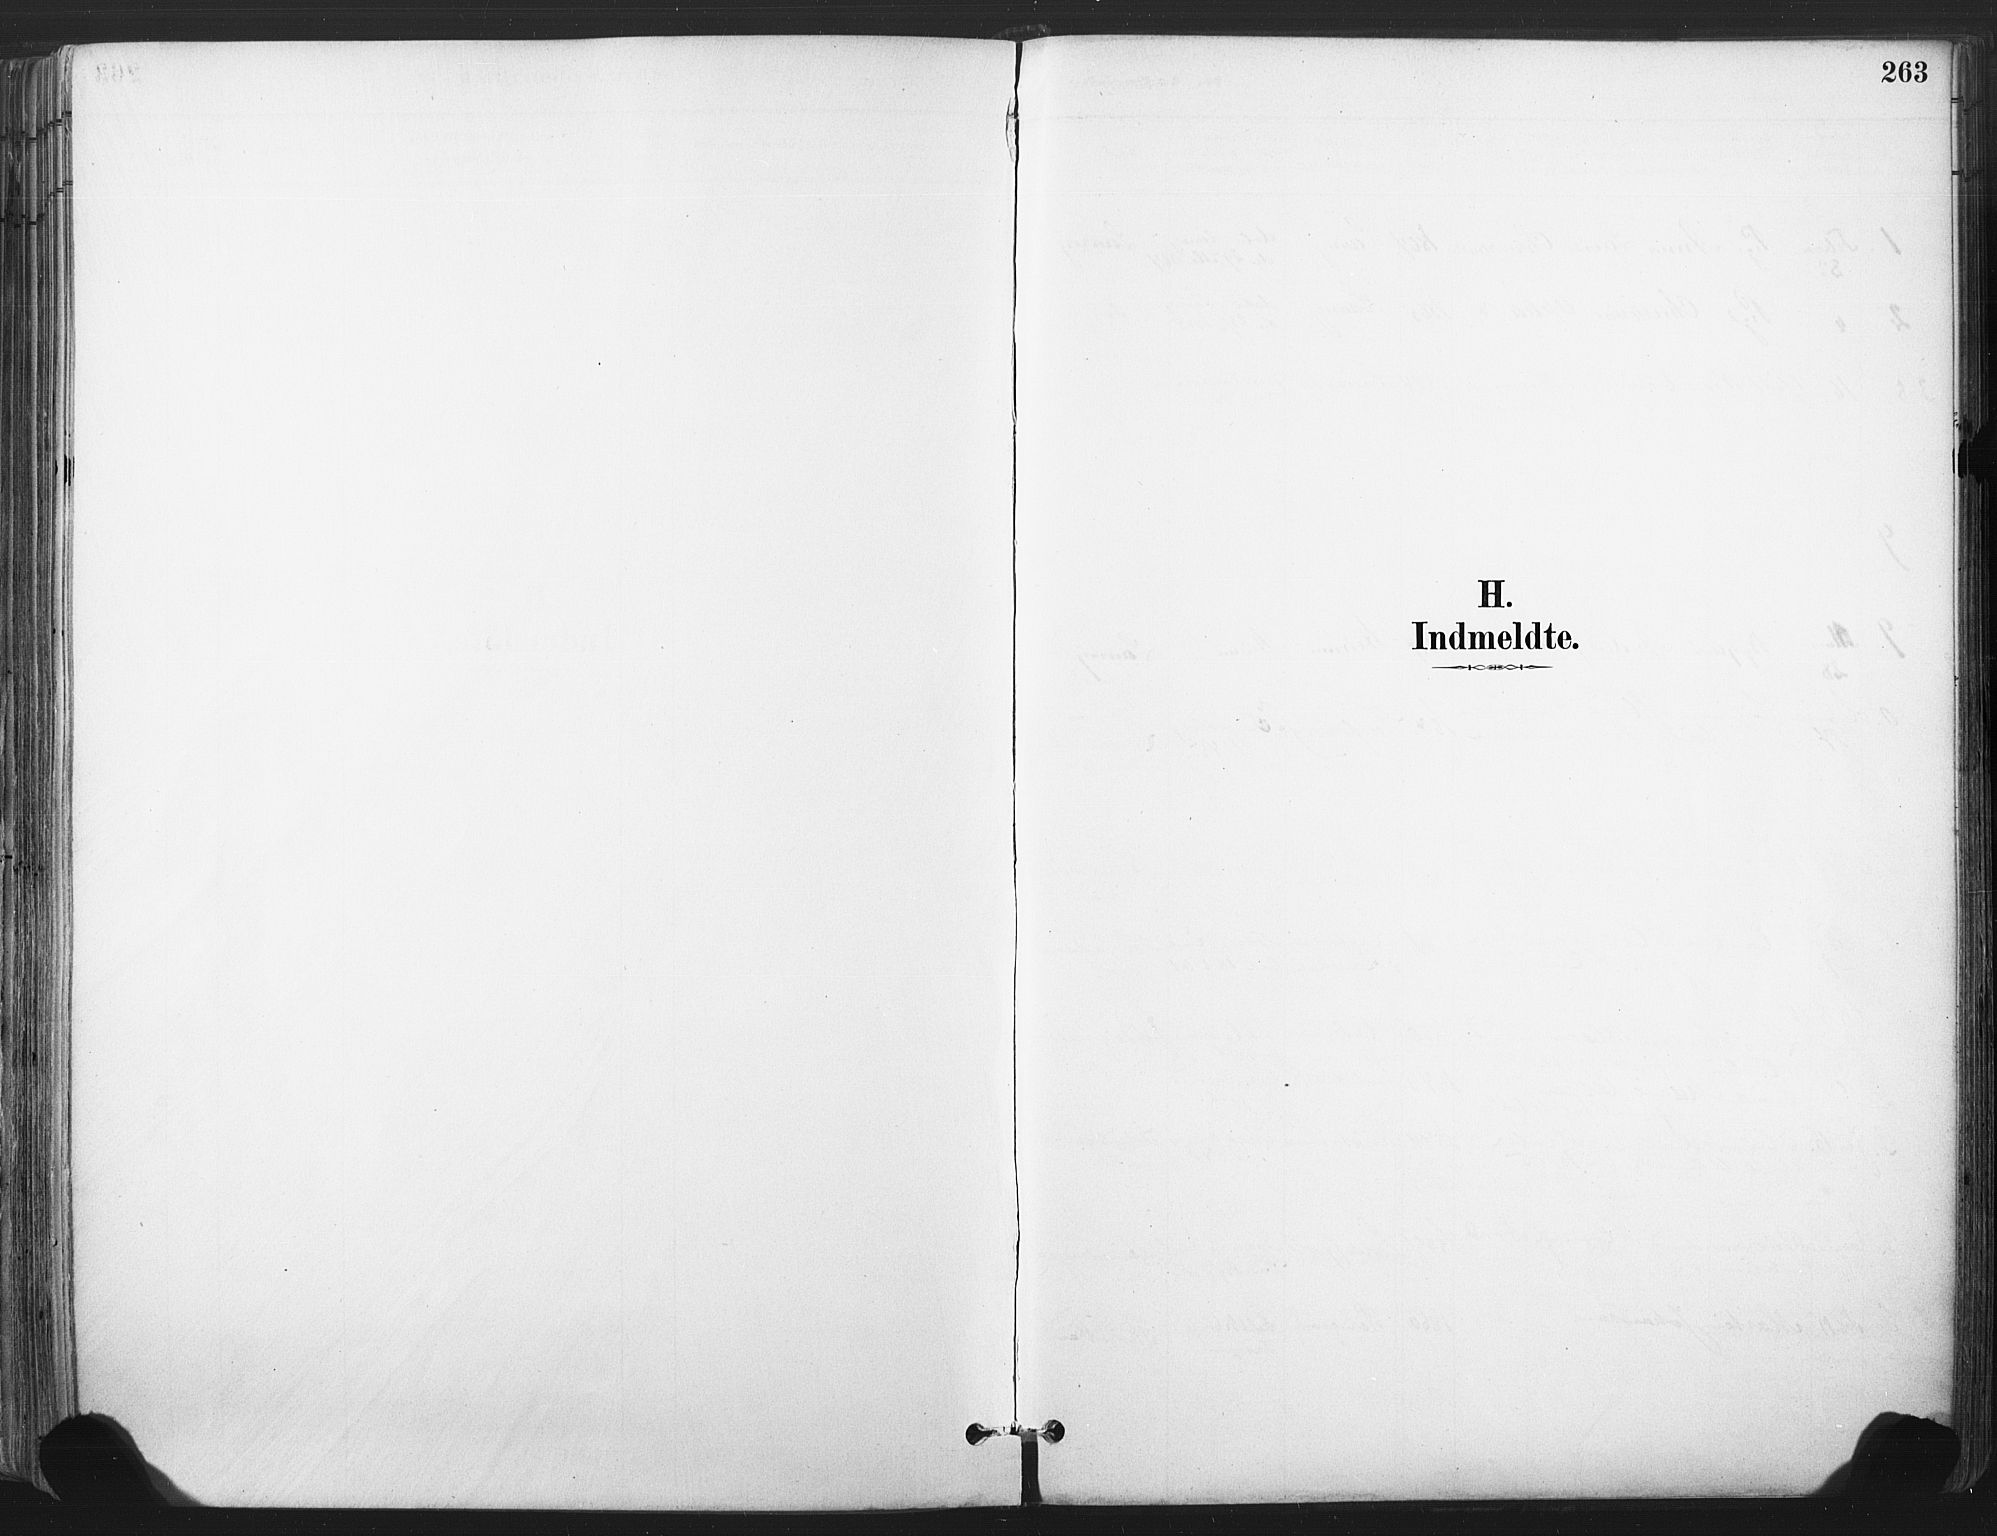 SAKO, Larvik kirkebøker, F/Fa/L0010: Ministerialbok nr. I 10, 1884-1910, s. 263